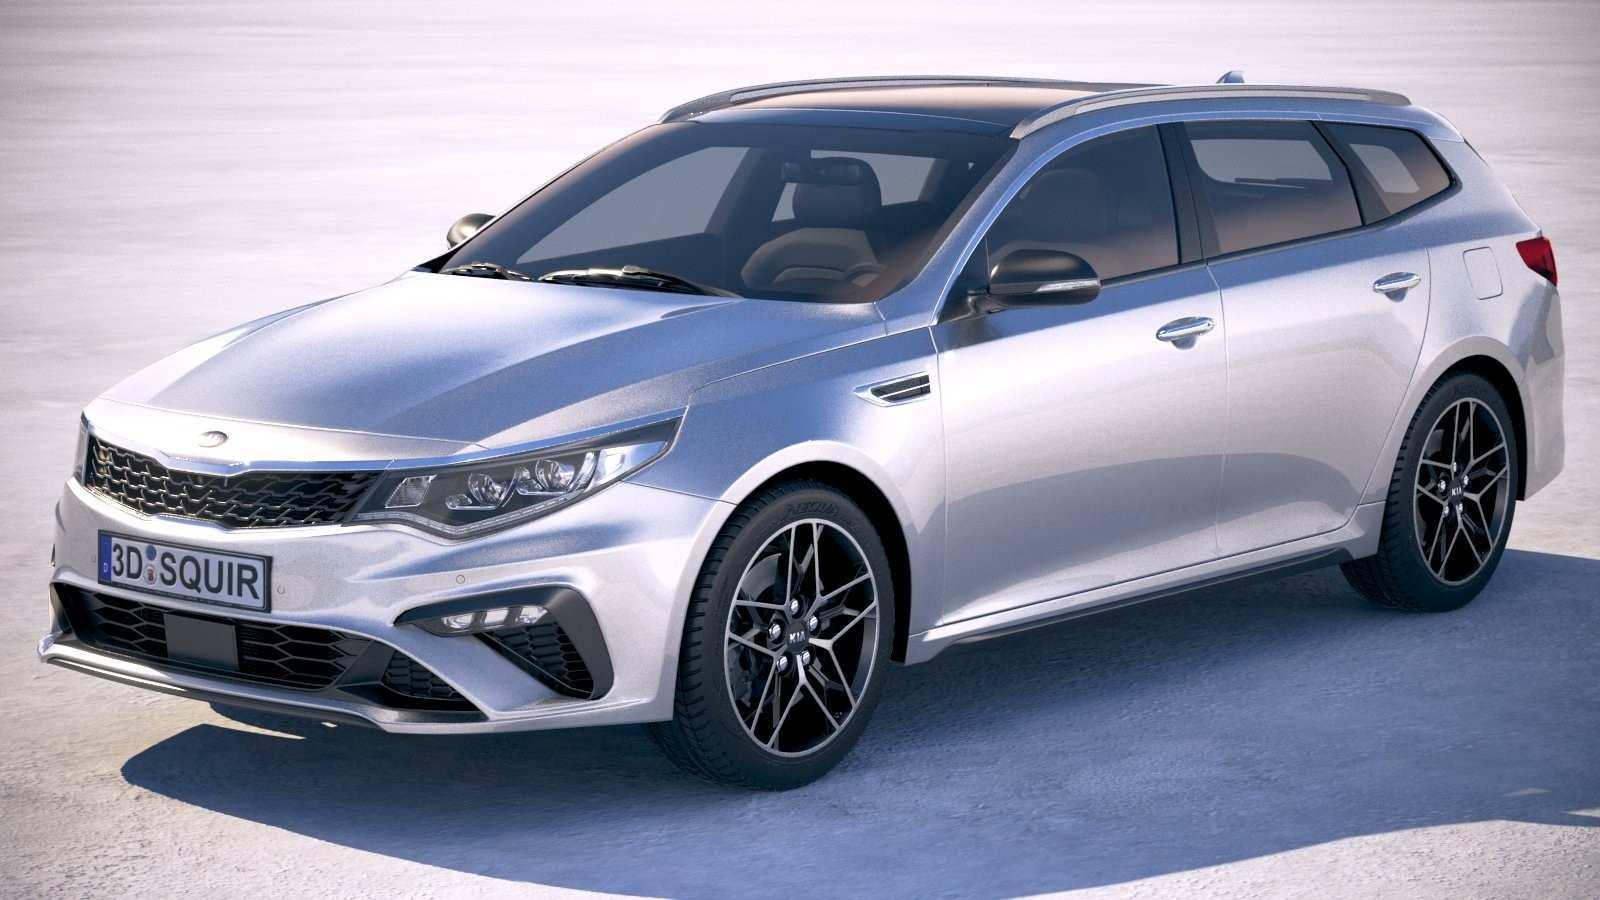 36 All New Kia Modelle 2019 Release Date with Kia Modelle 2019